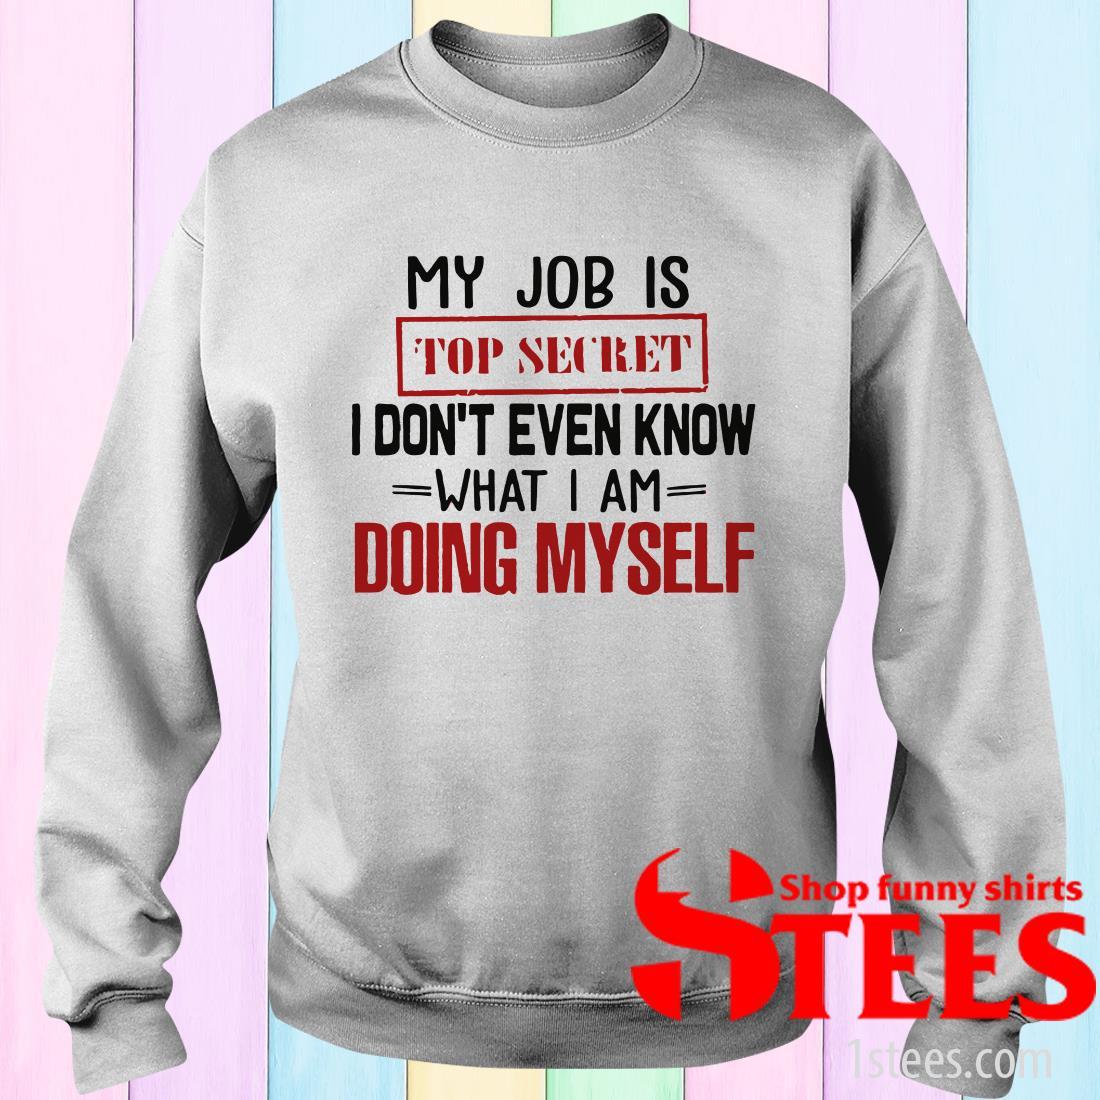 My Job Is Top Secret T-Shirt